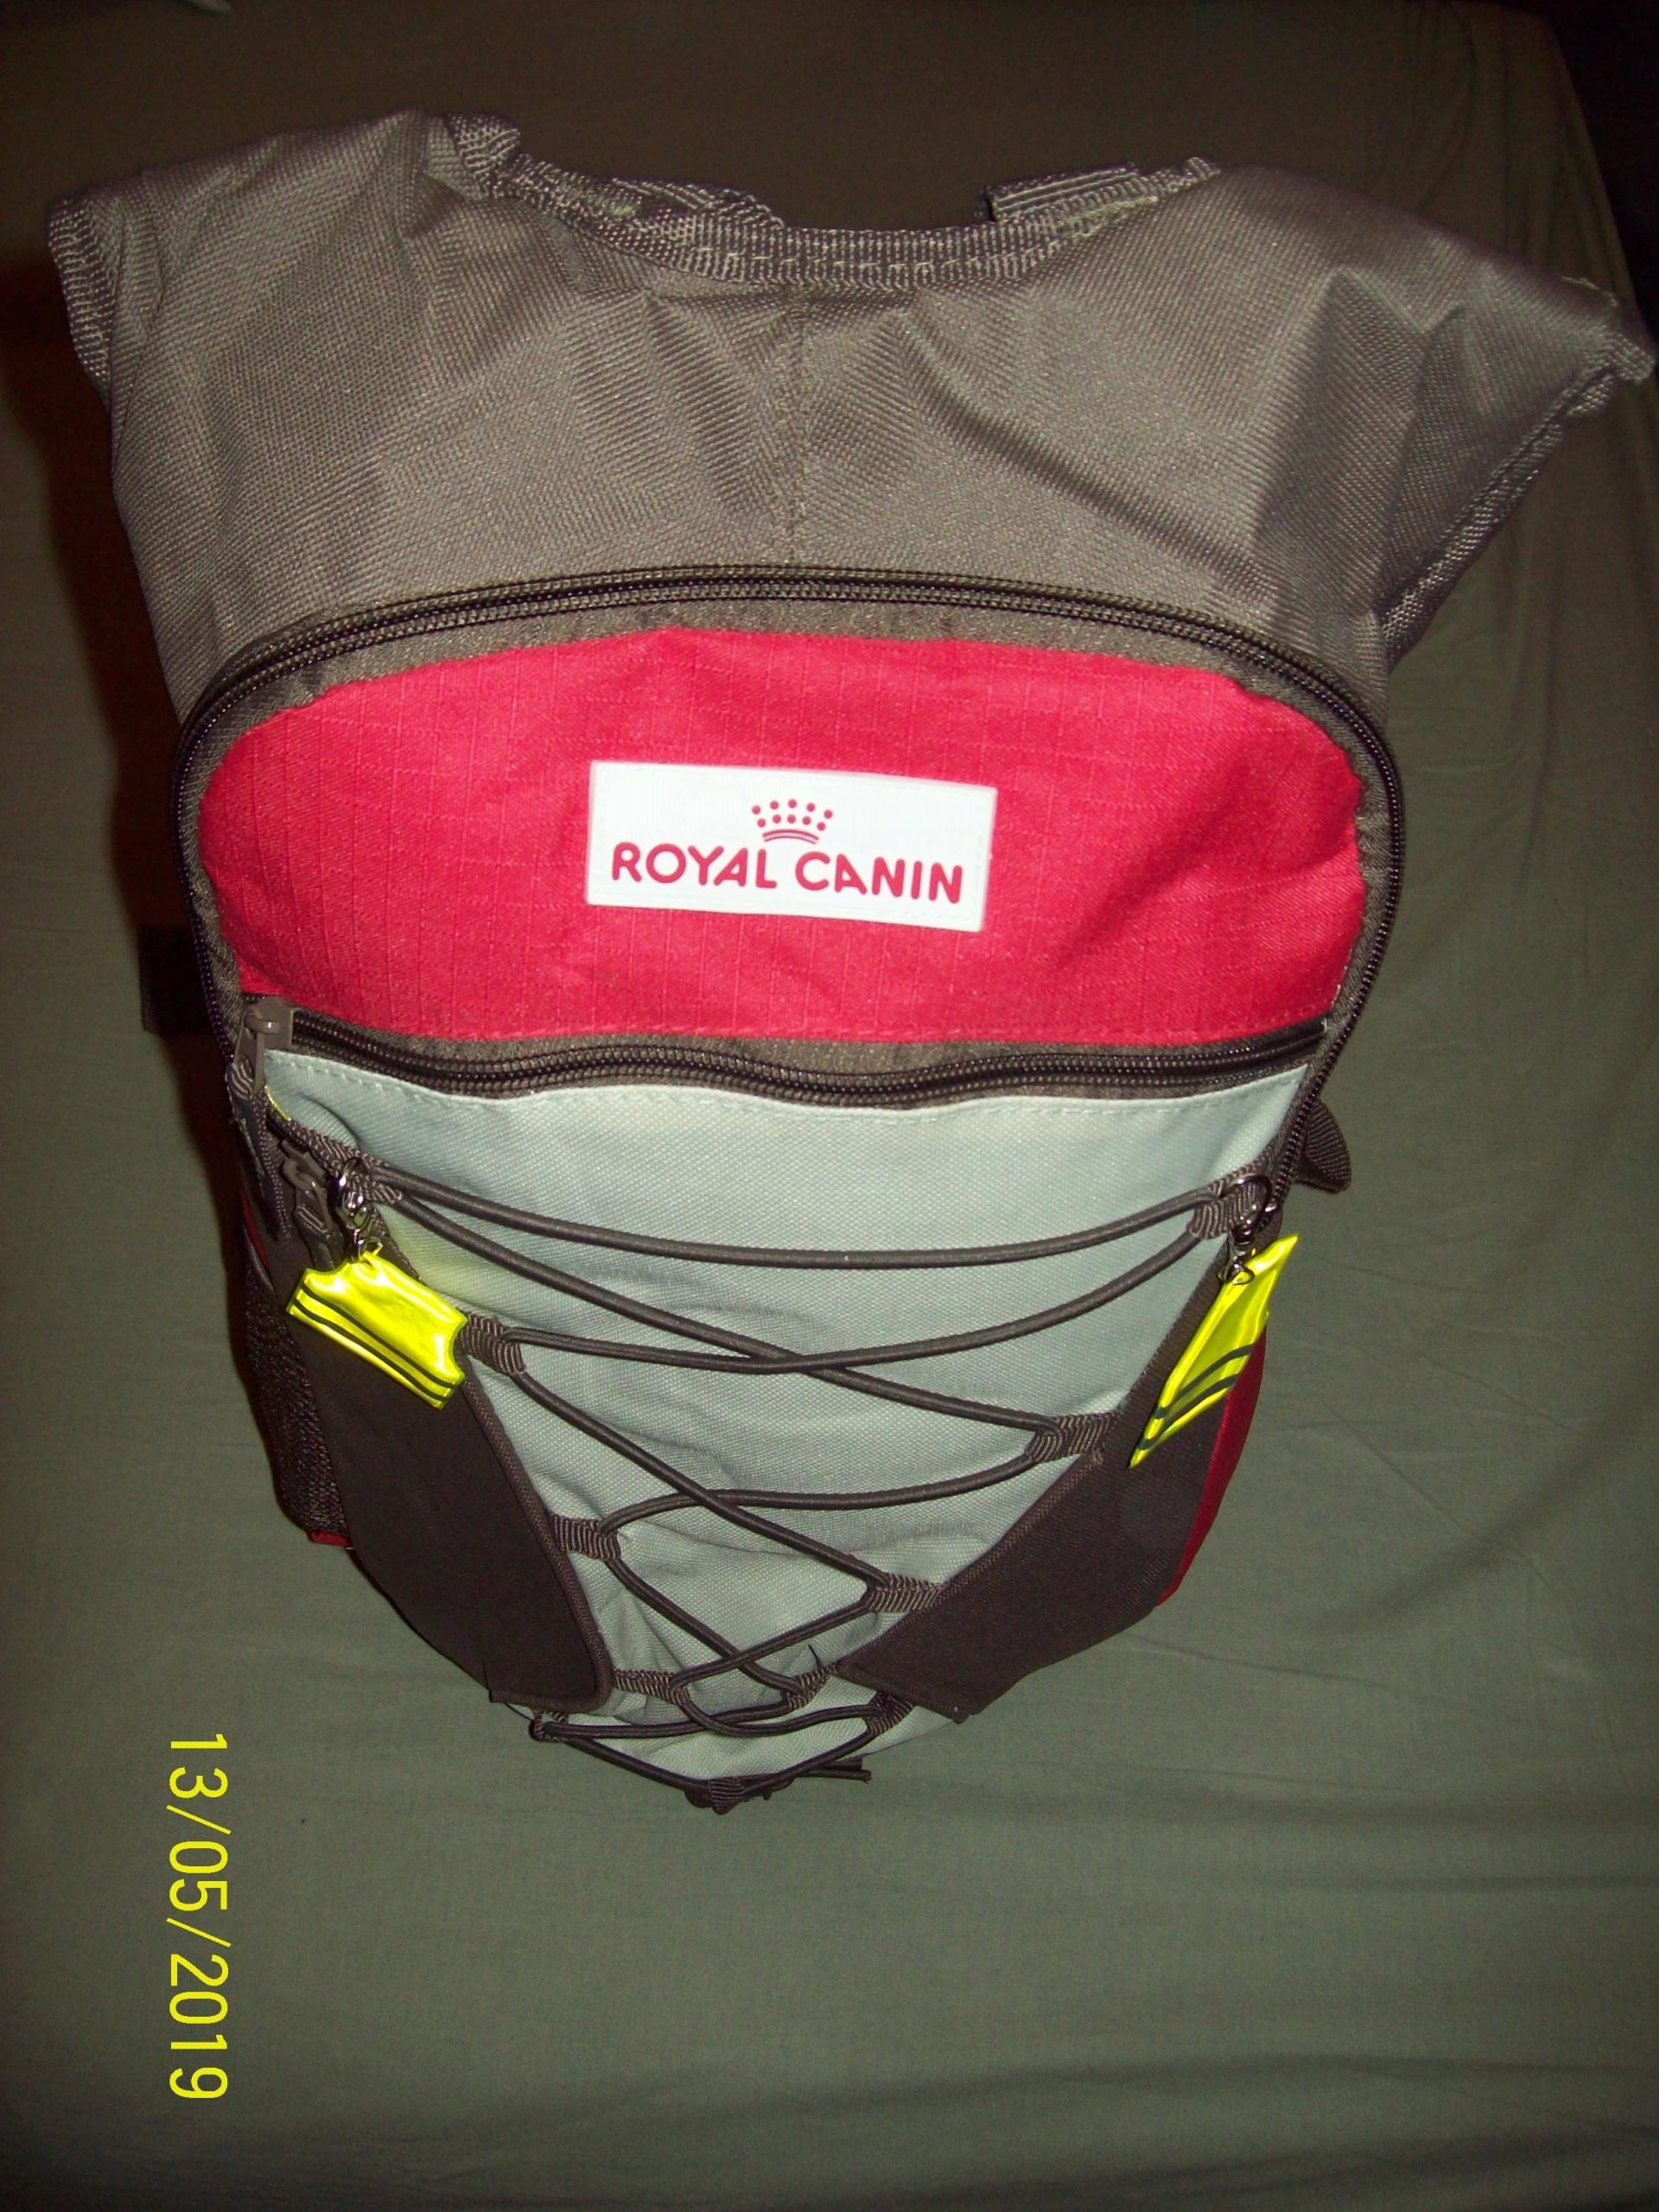 plecak 15-20 l Royal Canin do trekingu + gratisy